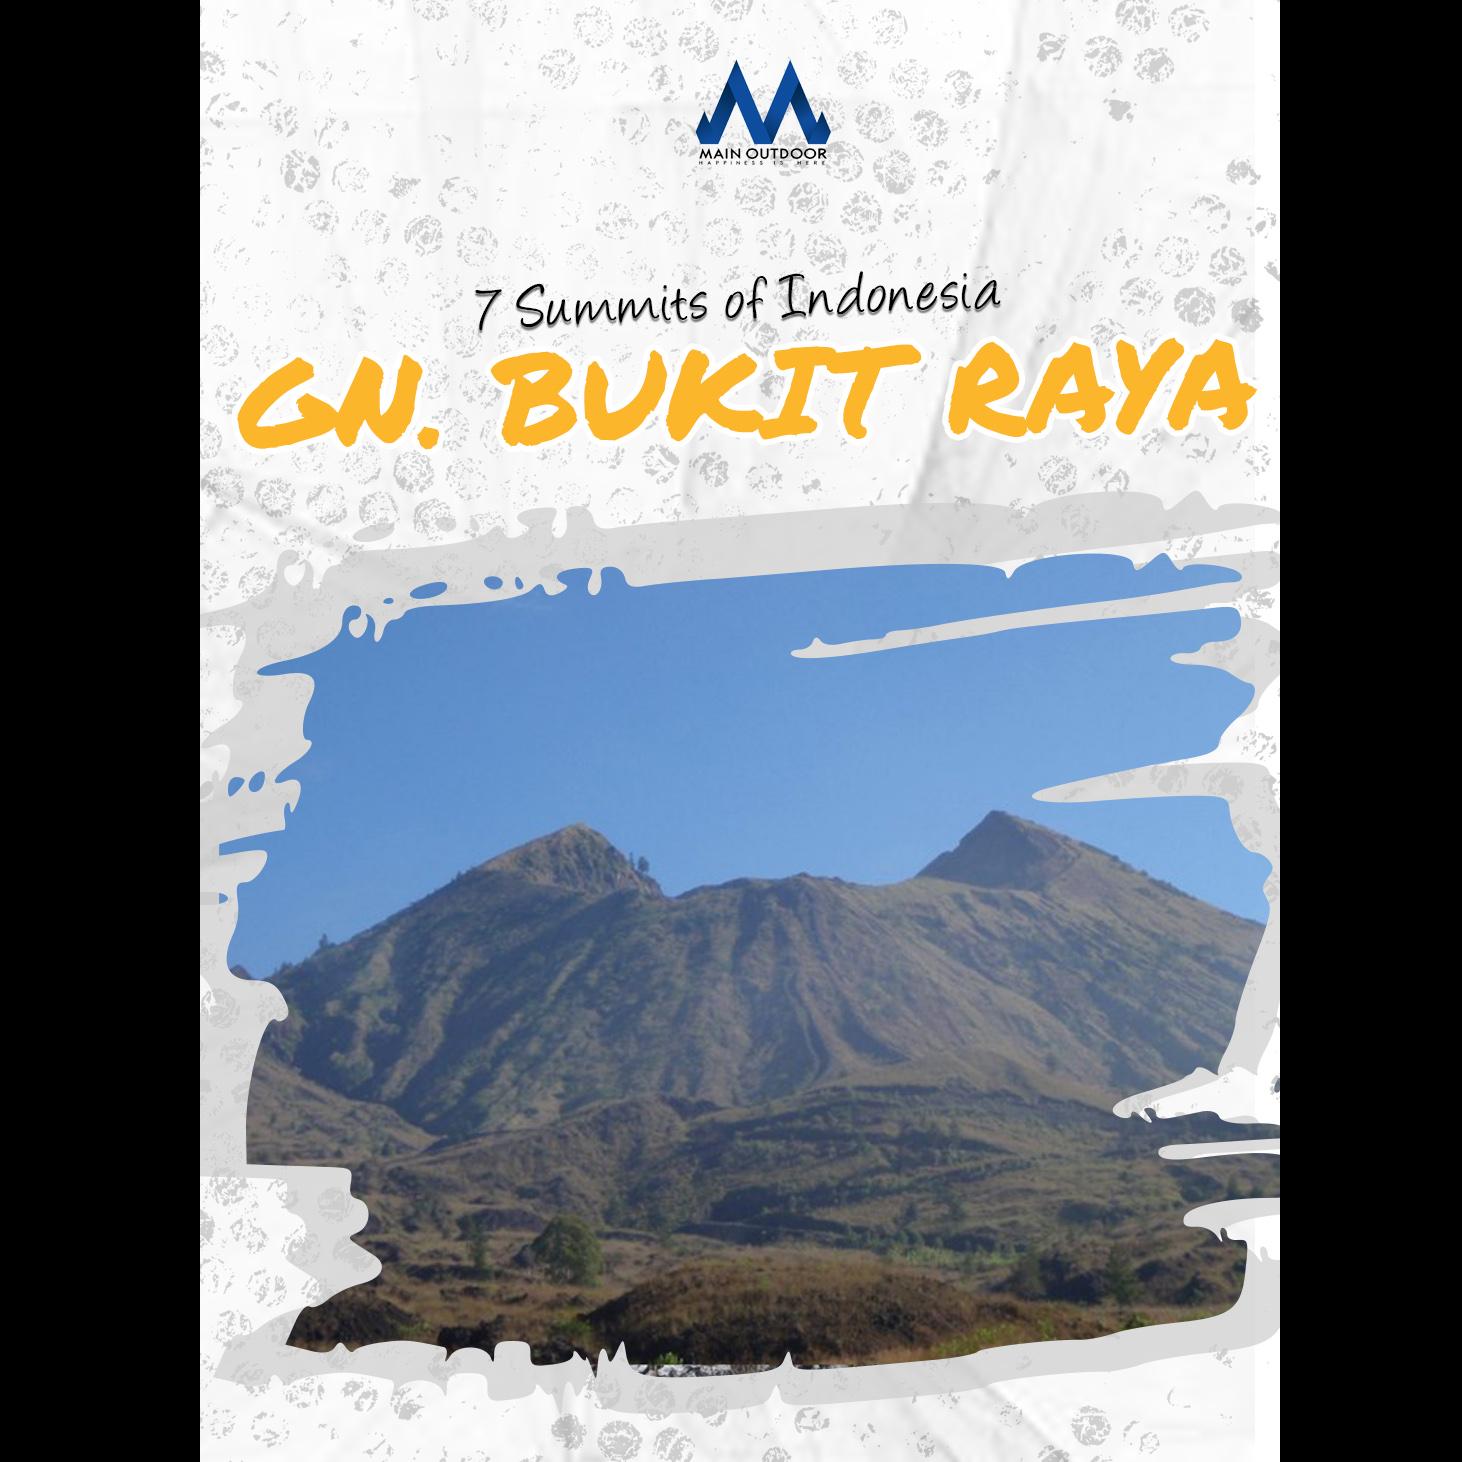 Mt. Bukit Raya 7 Summit Indonesia